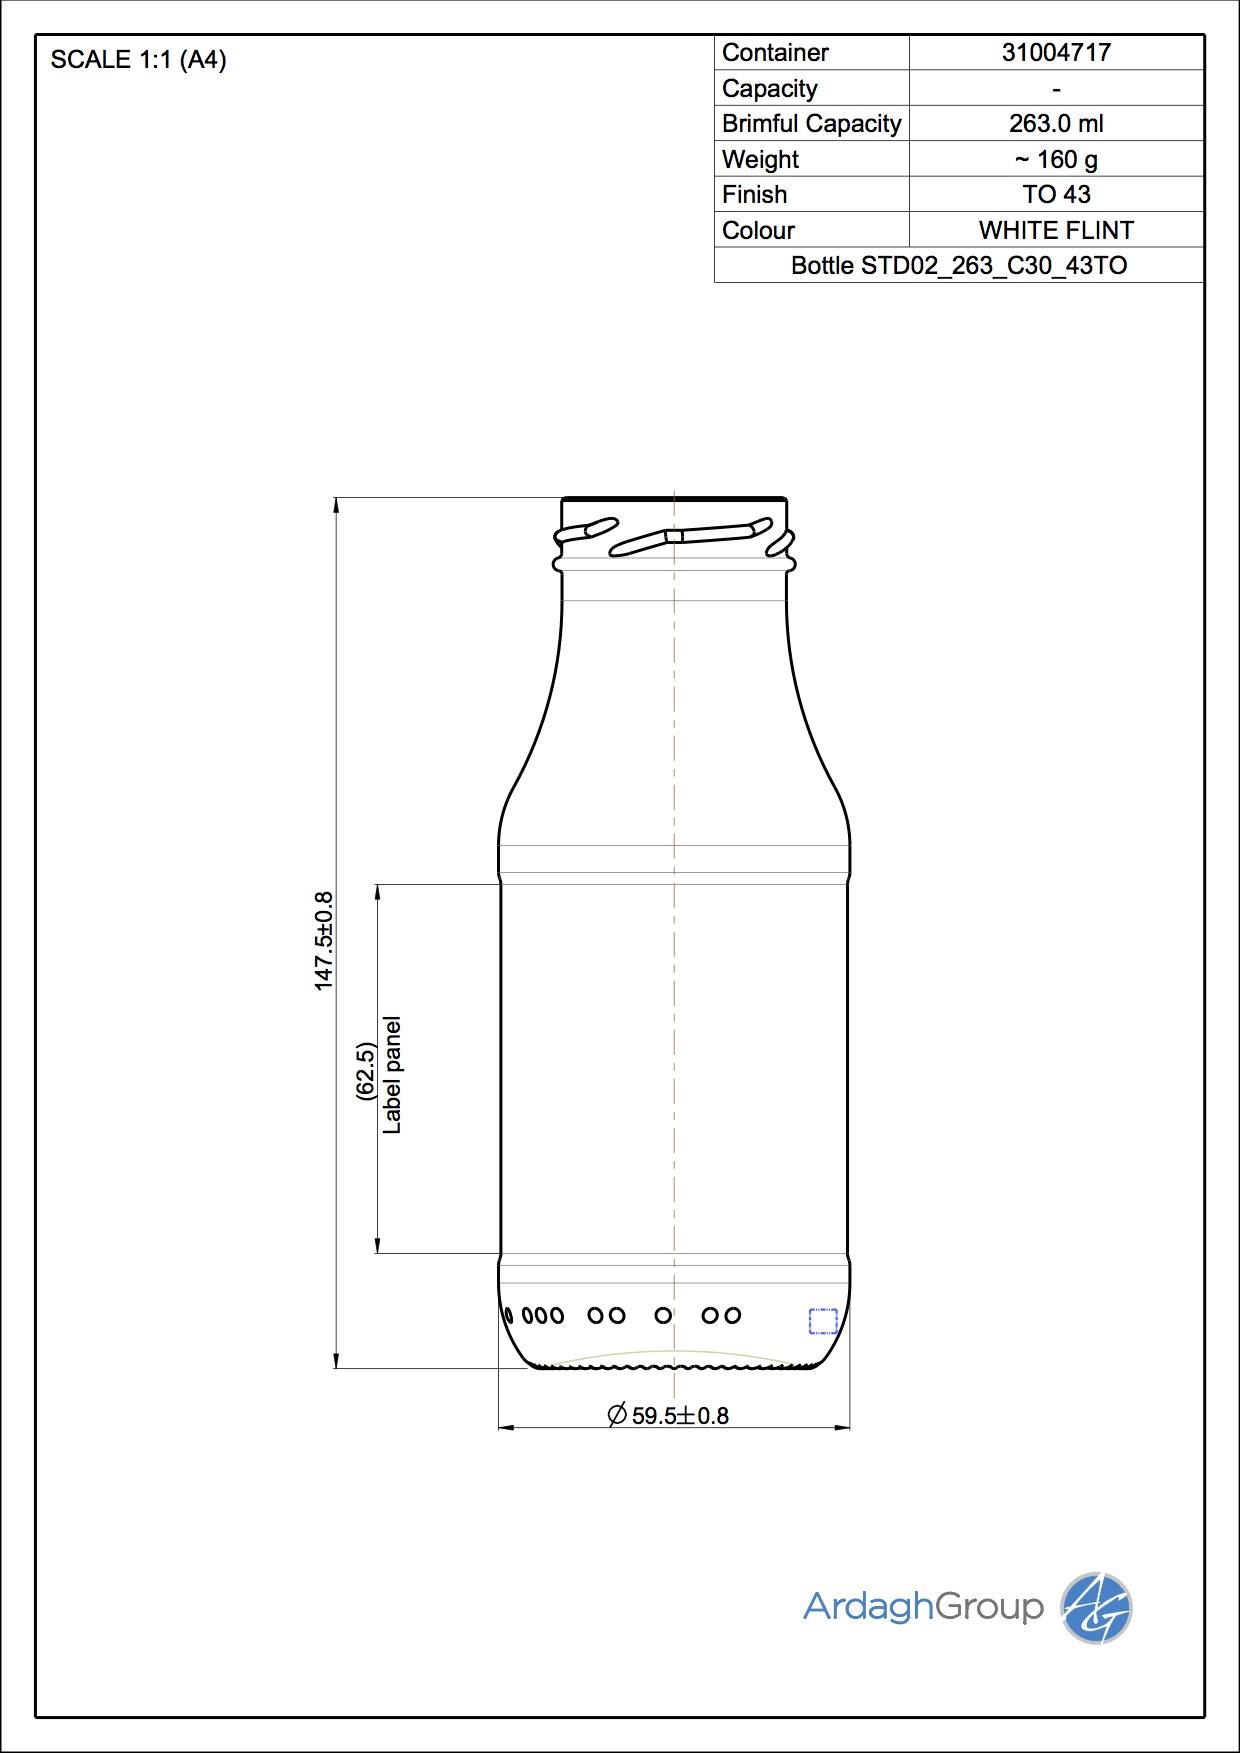 Bottle STD02 263 C30 43TO